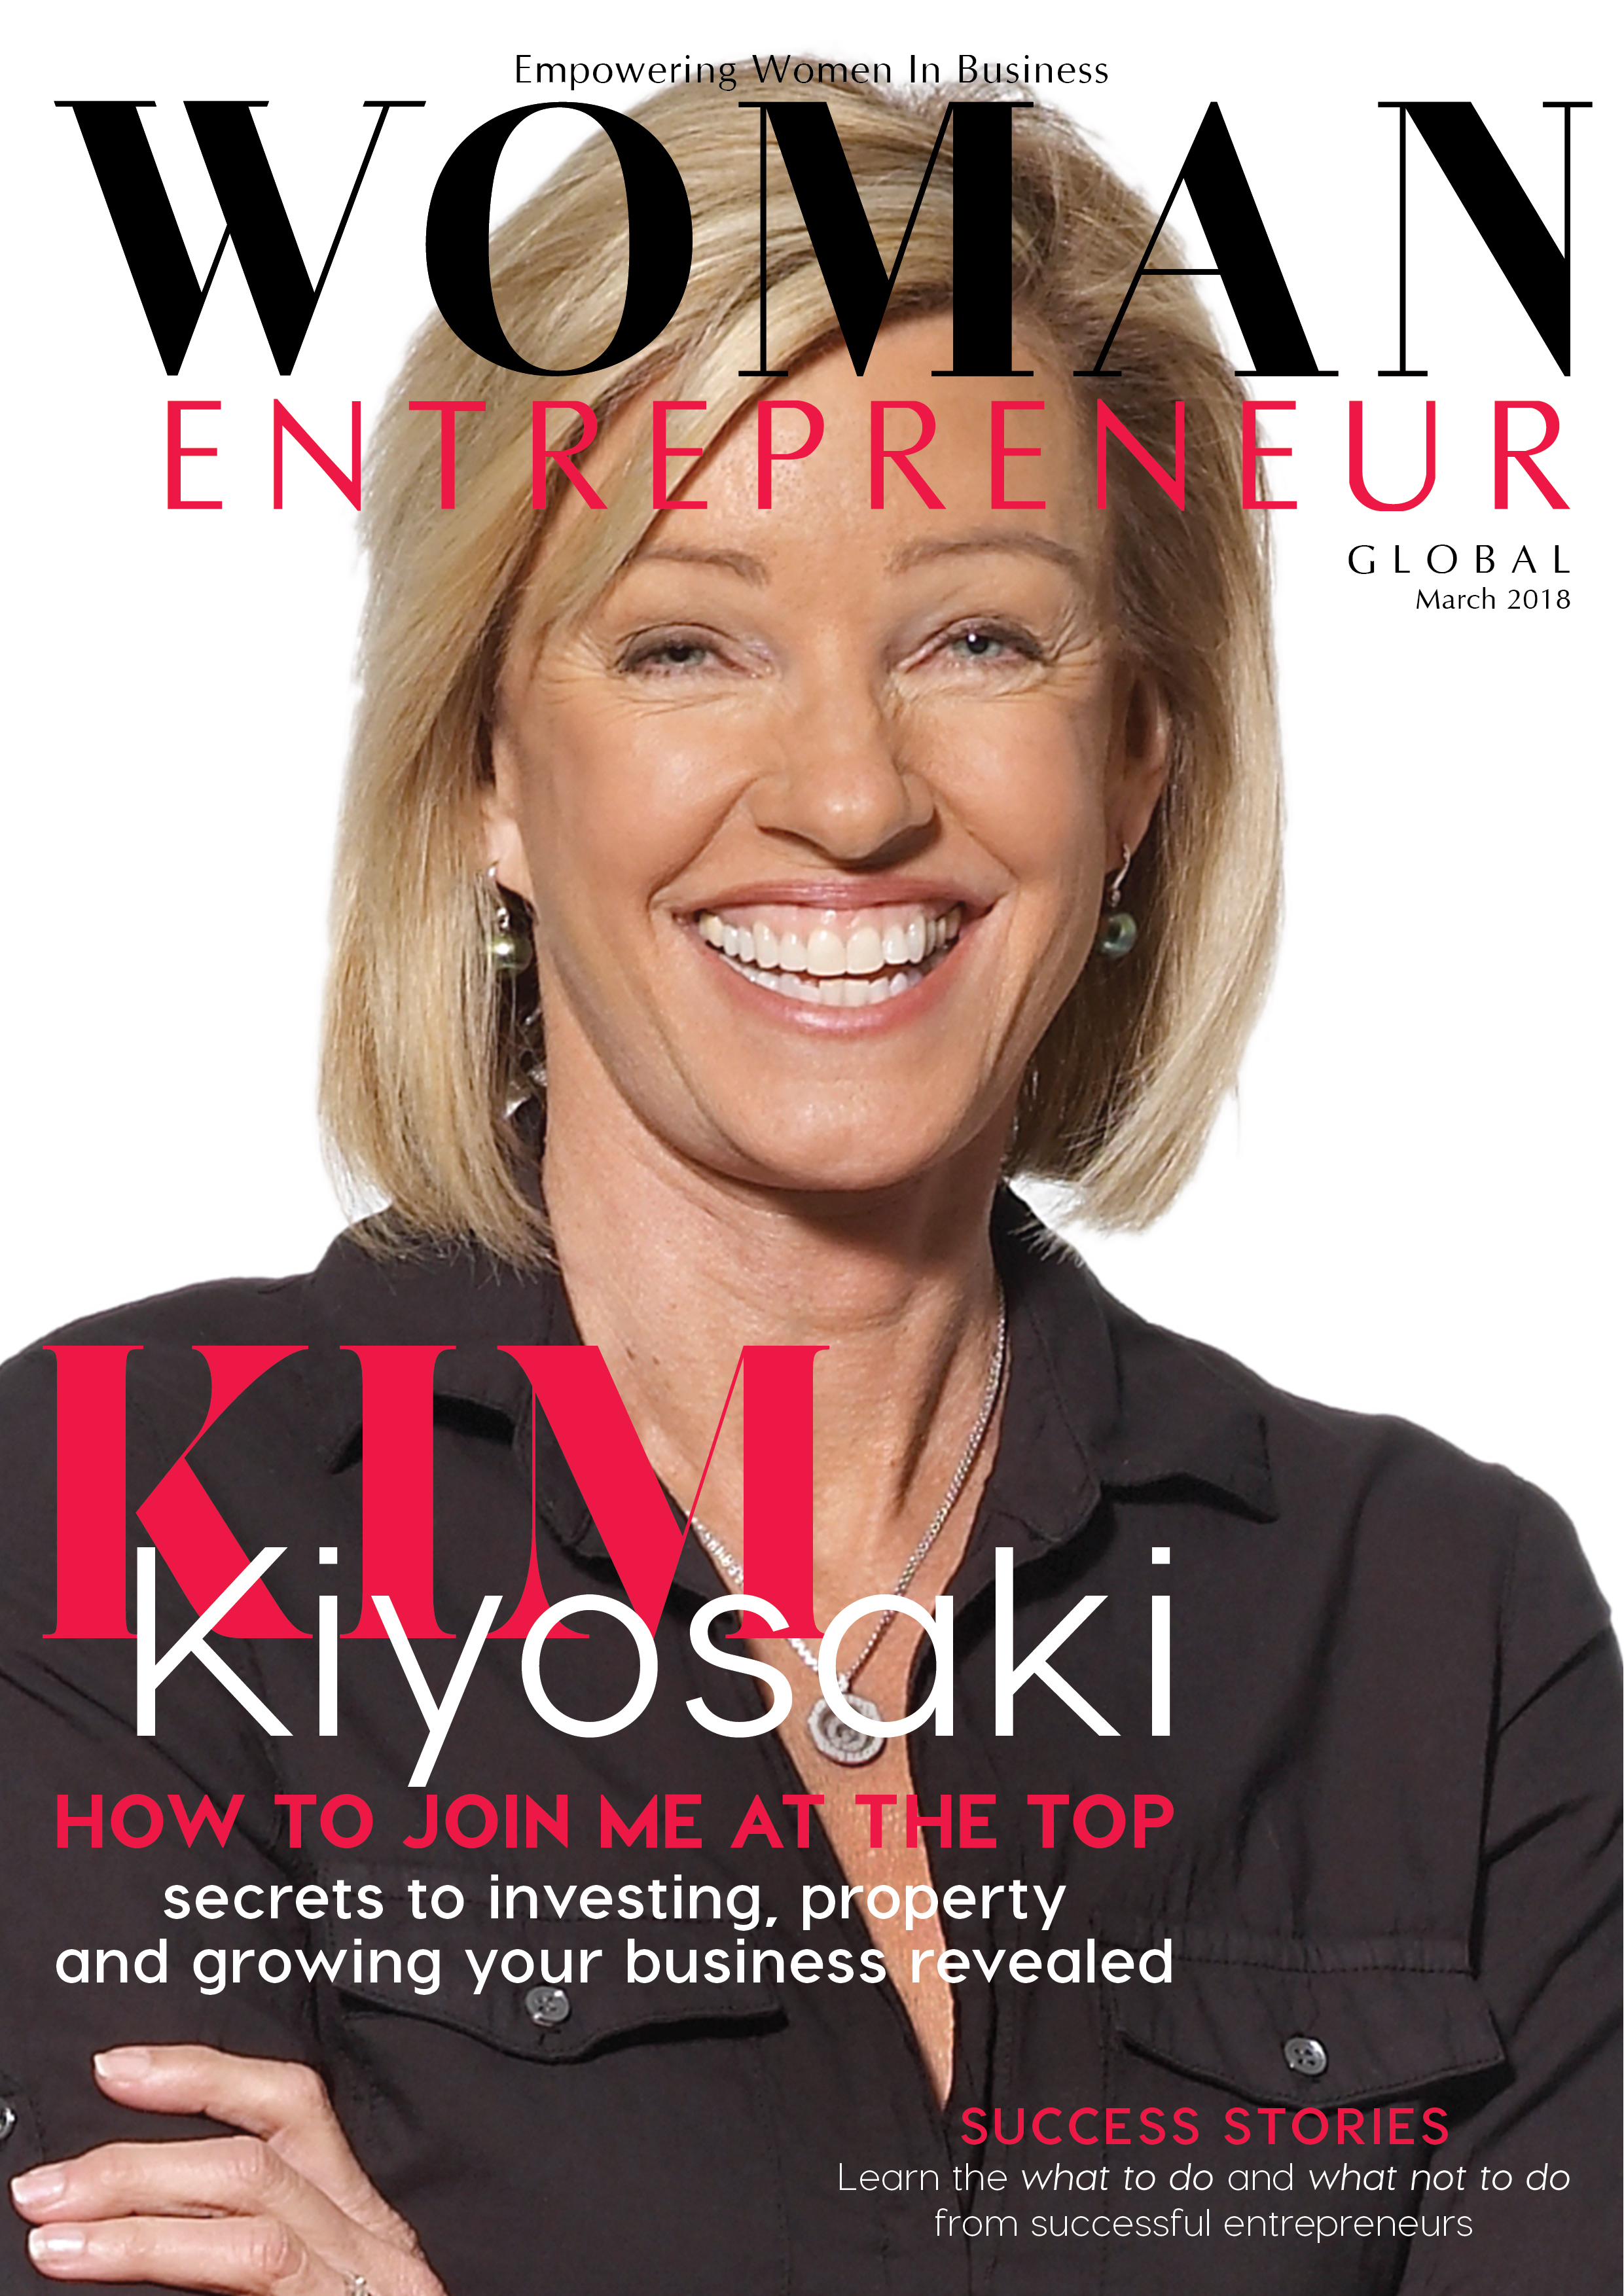 Kim Kiyosaki on Woman Entrepreneur Magazine Cover.jpg